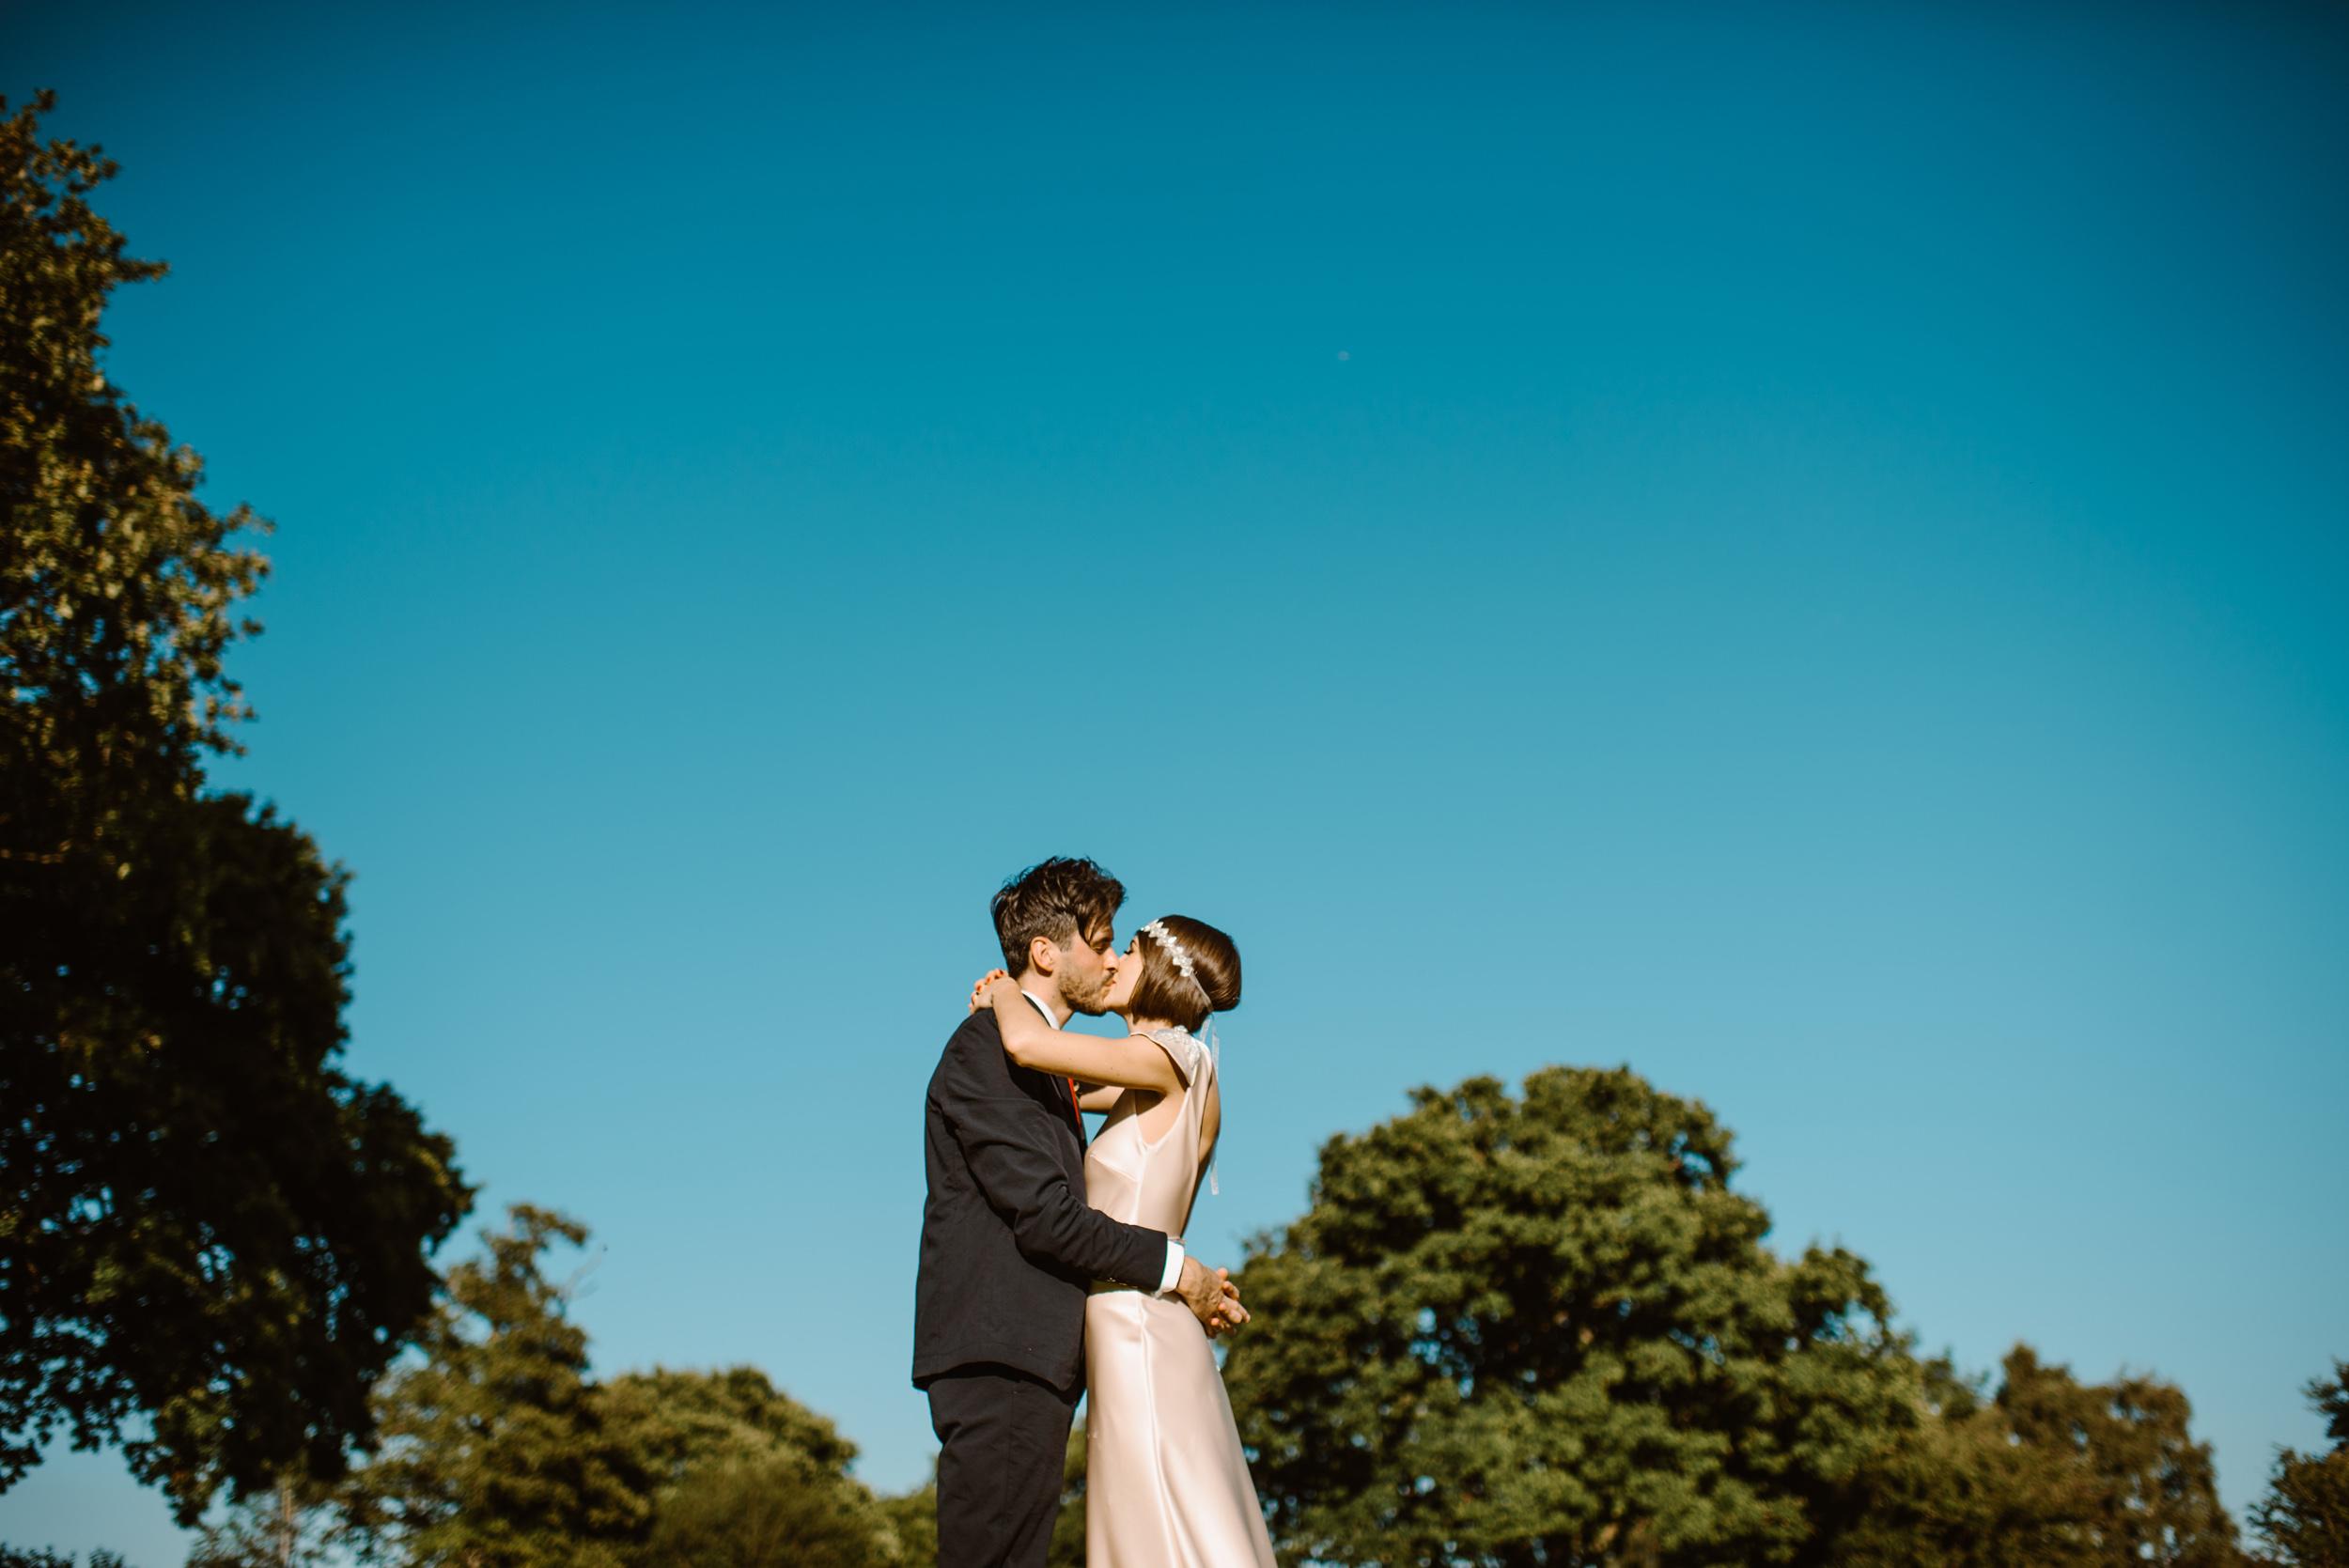 Ro-Kate-Beaumont-bias-cut-silk-wedding-gown-back-garden-wedding-by-Ellie-Gillard-21.jpg